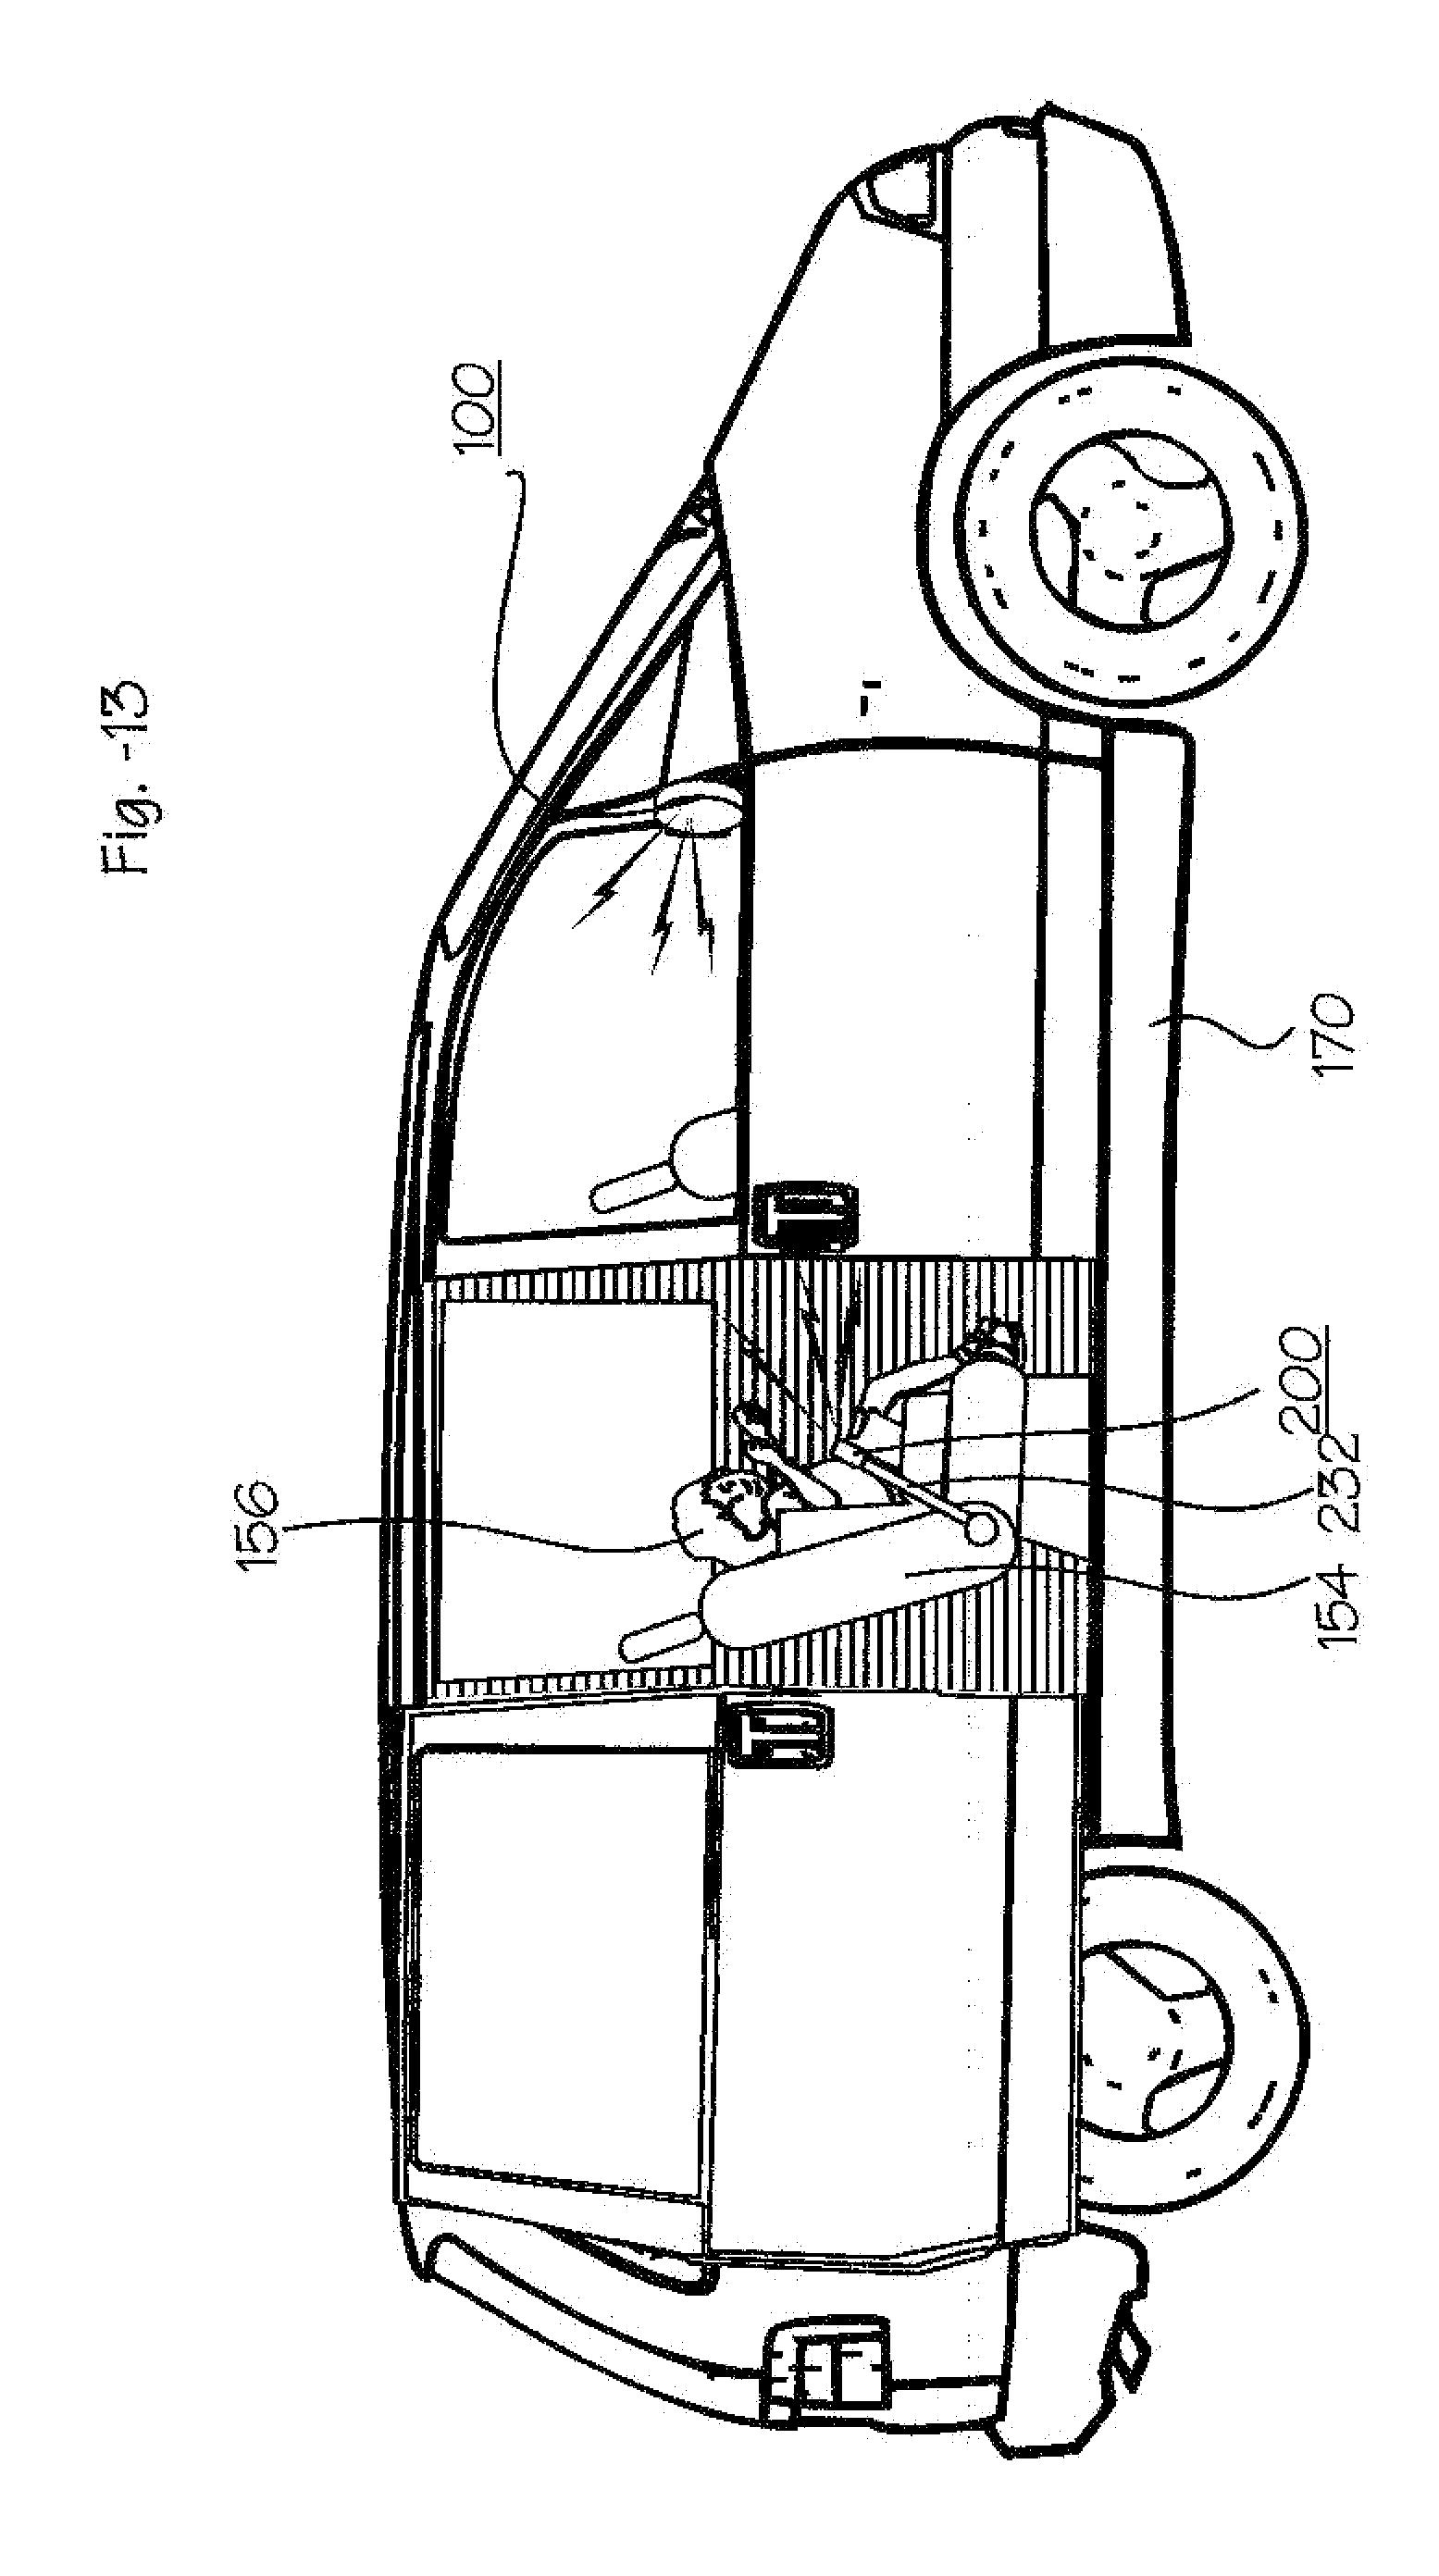 seat belt diagram google  seat  auto parts catalog and diagram